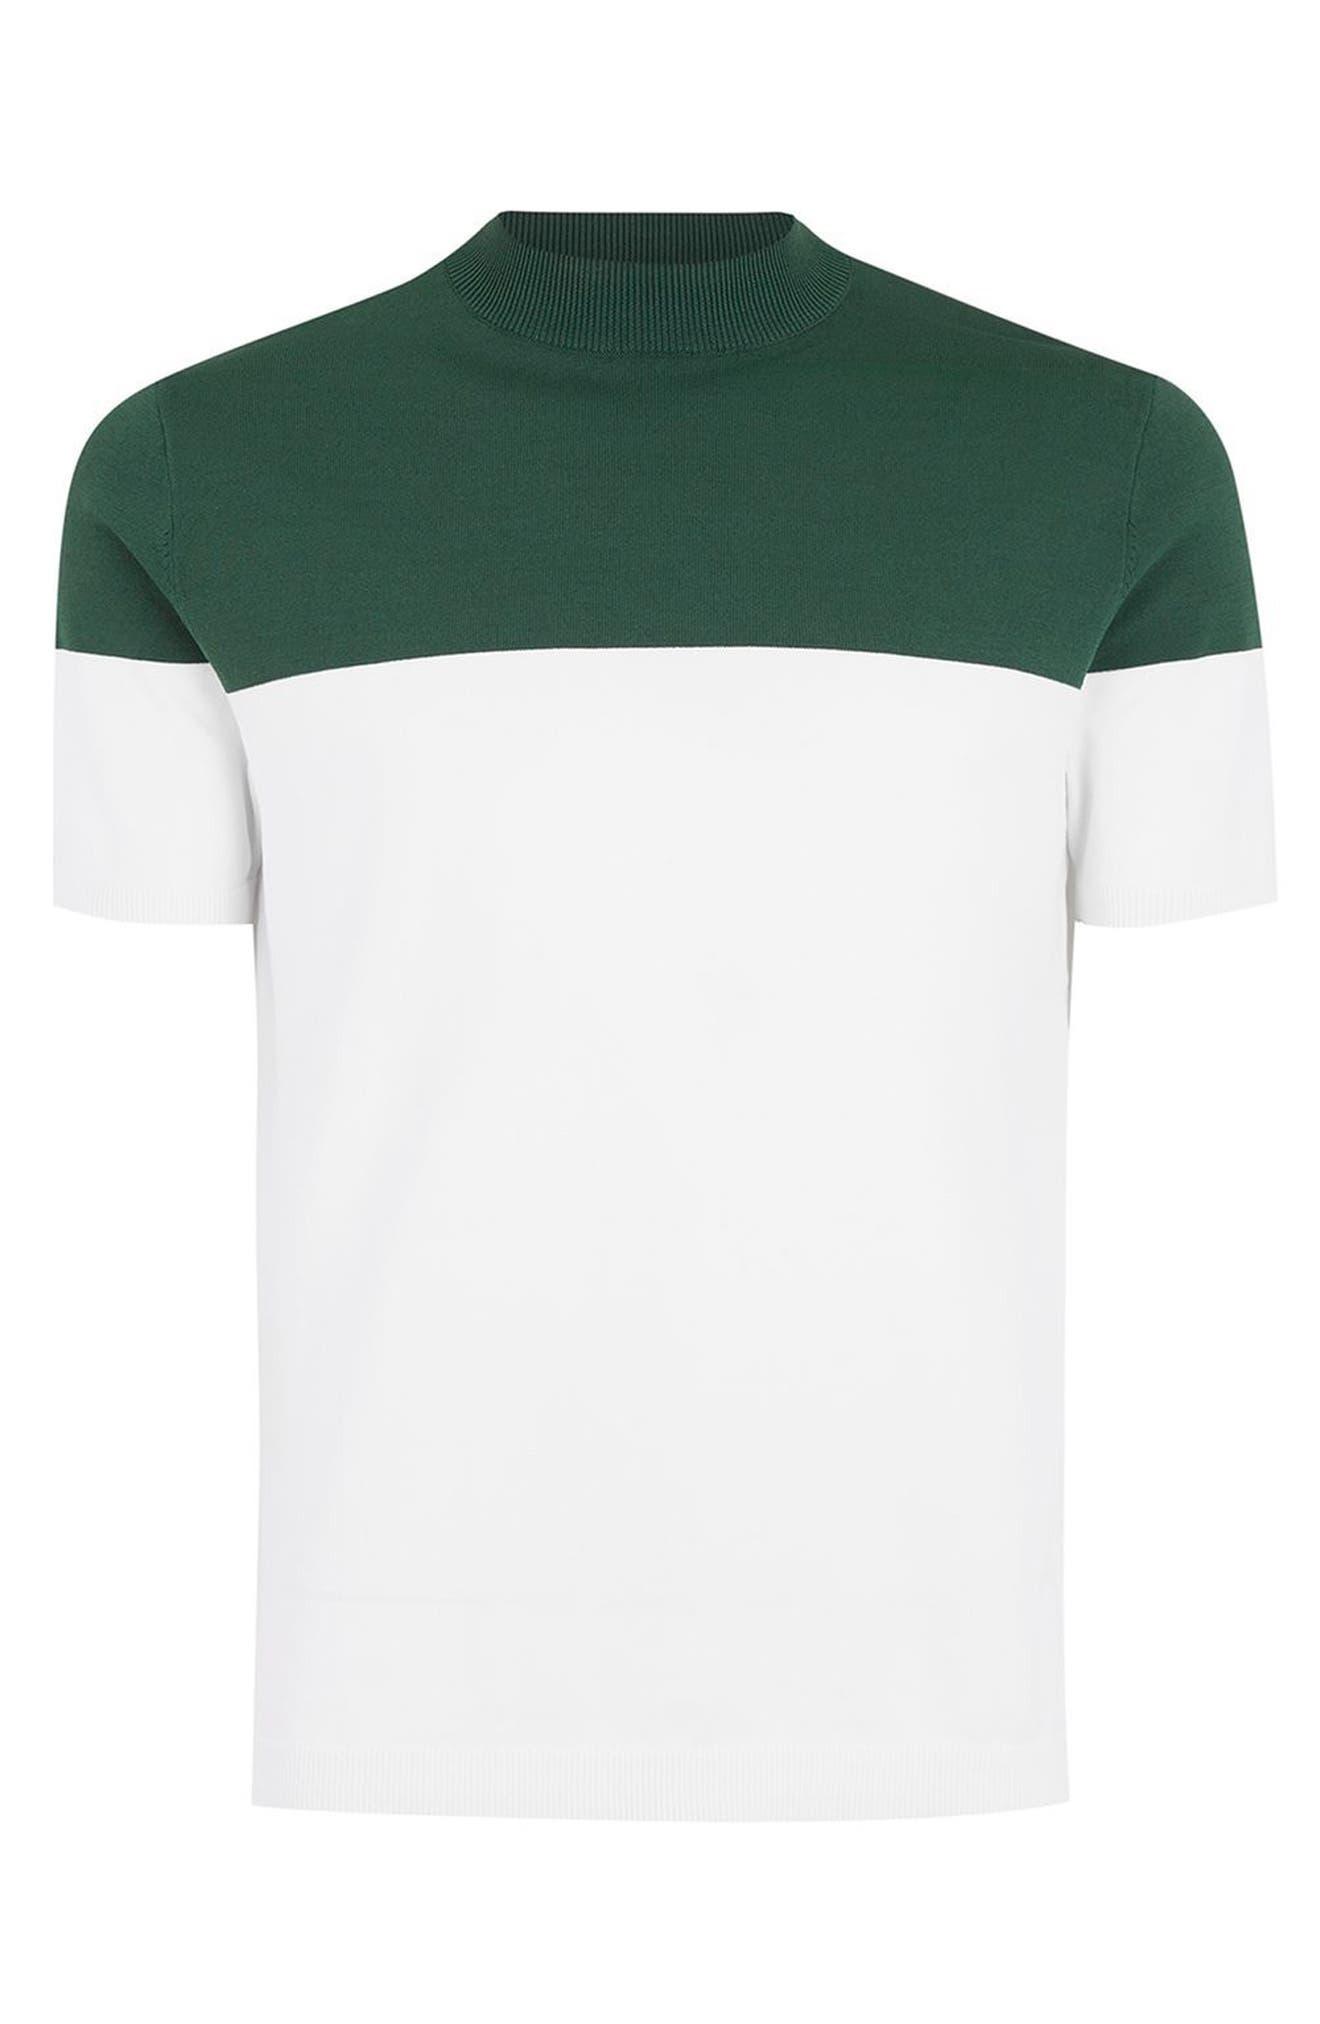 Colorblock Mock Neck Sweater,                             Alternate thumbnail 4, color,                             Green Multi